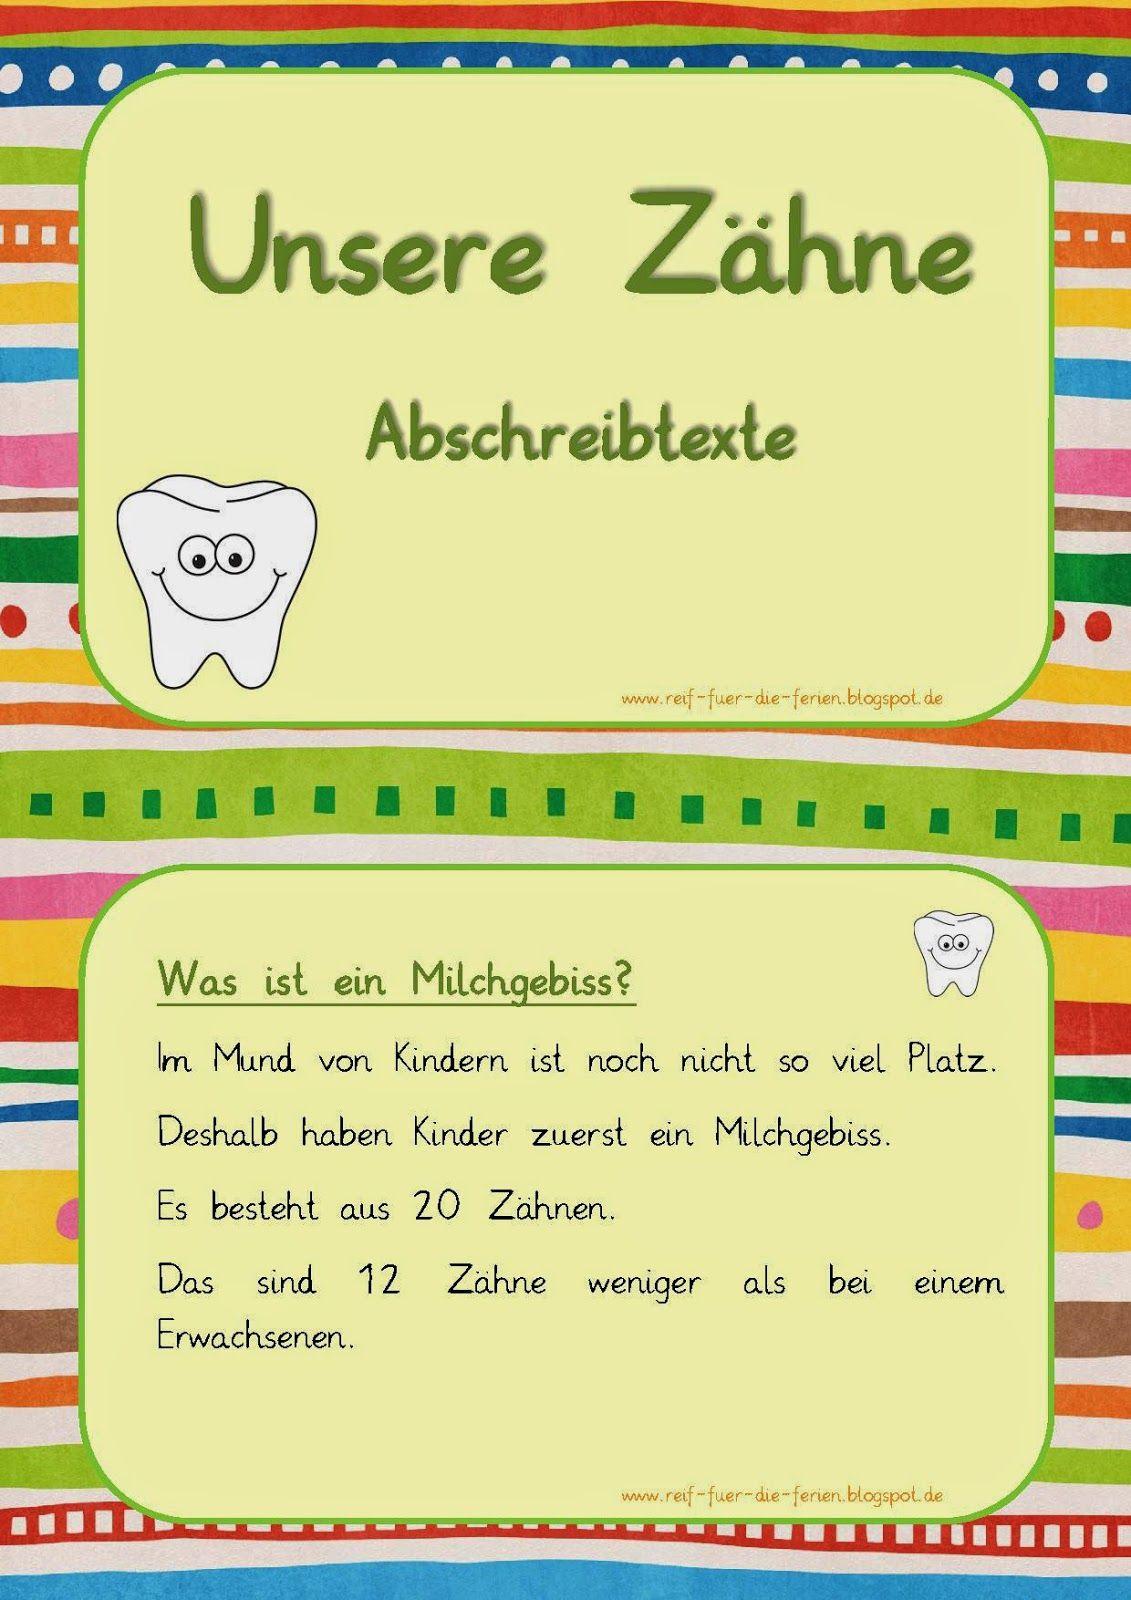 Zähne - Abschreibtexte | kézműves | Pinterest | School, Deutsch and ...